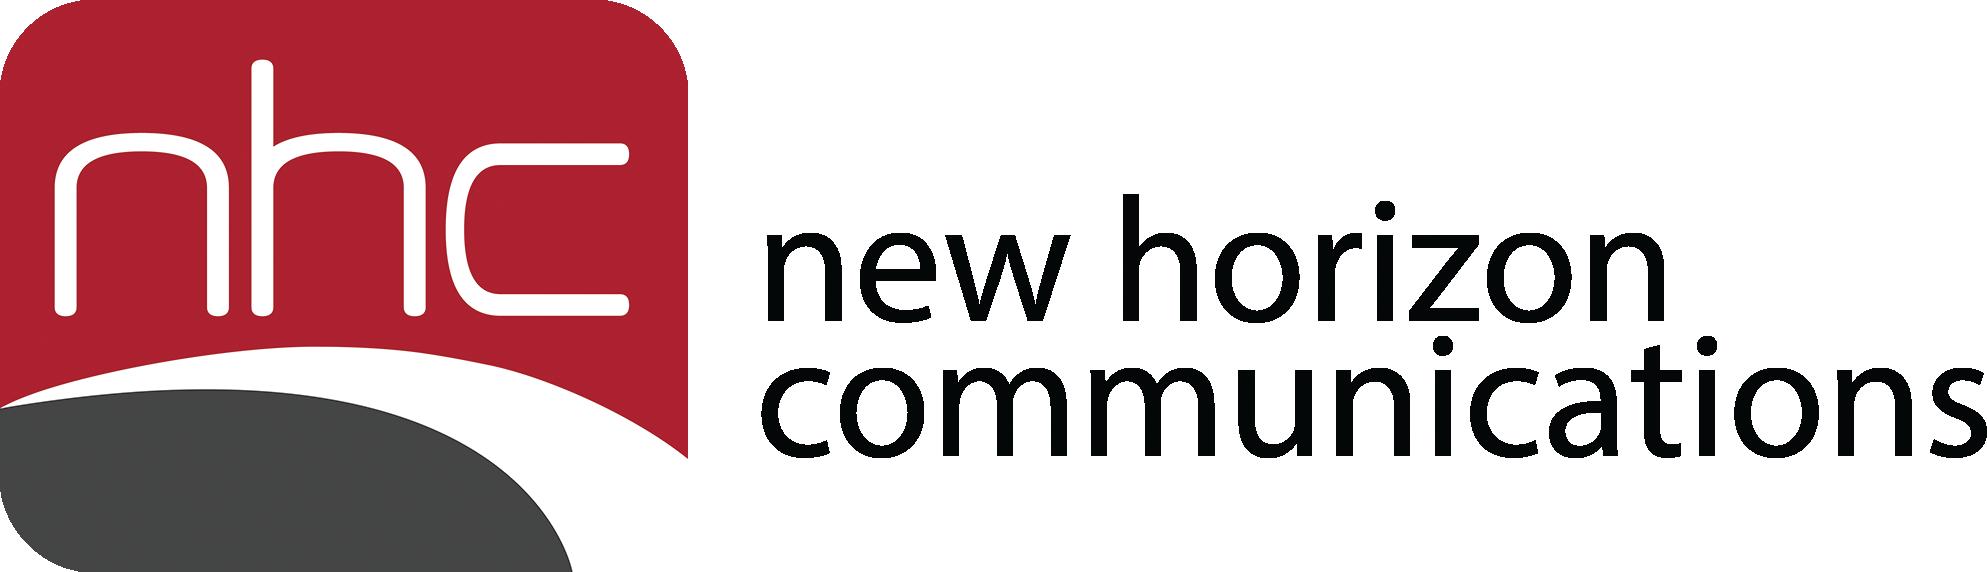 NHC Logo - COMPANY LETTERHEAD FINAL